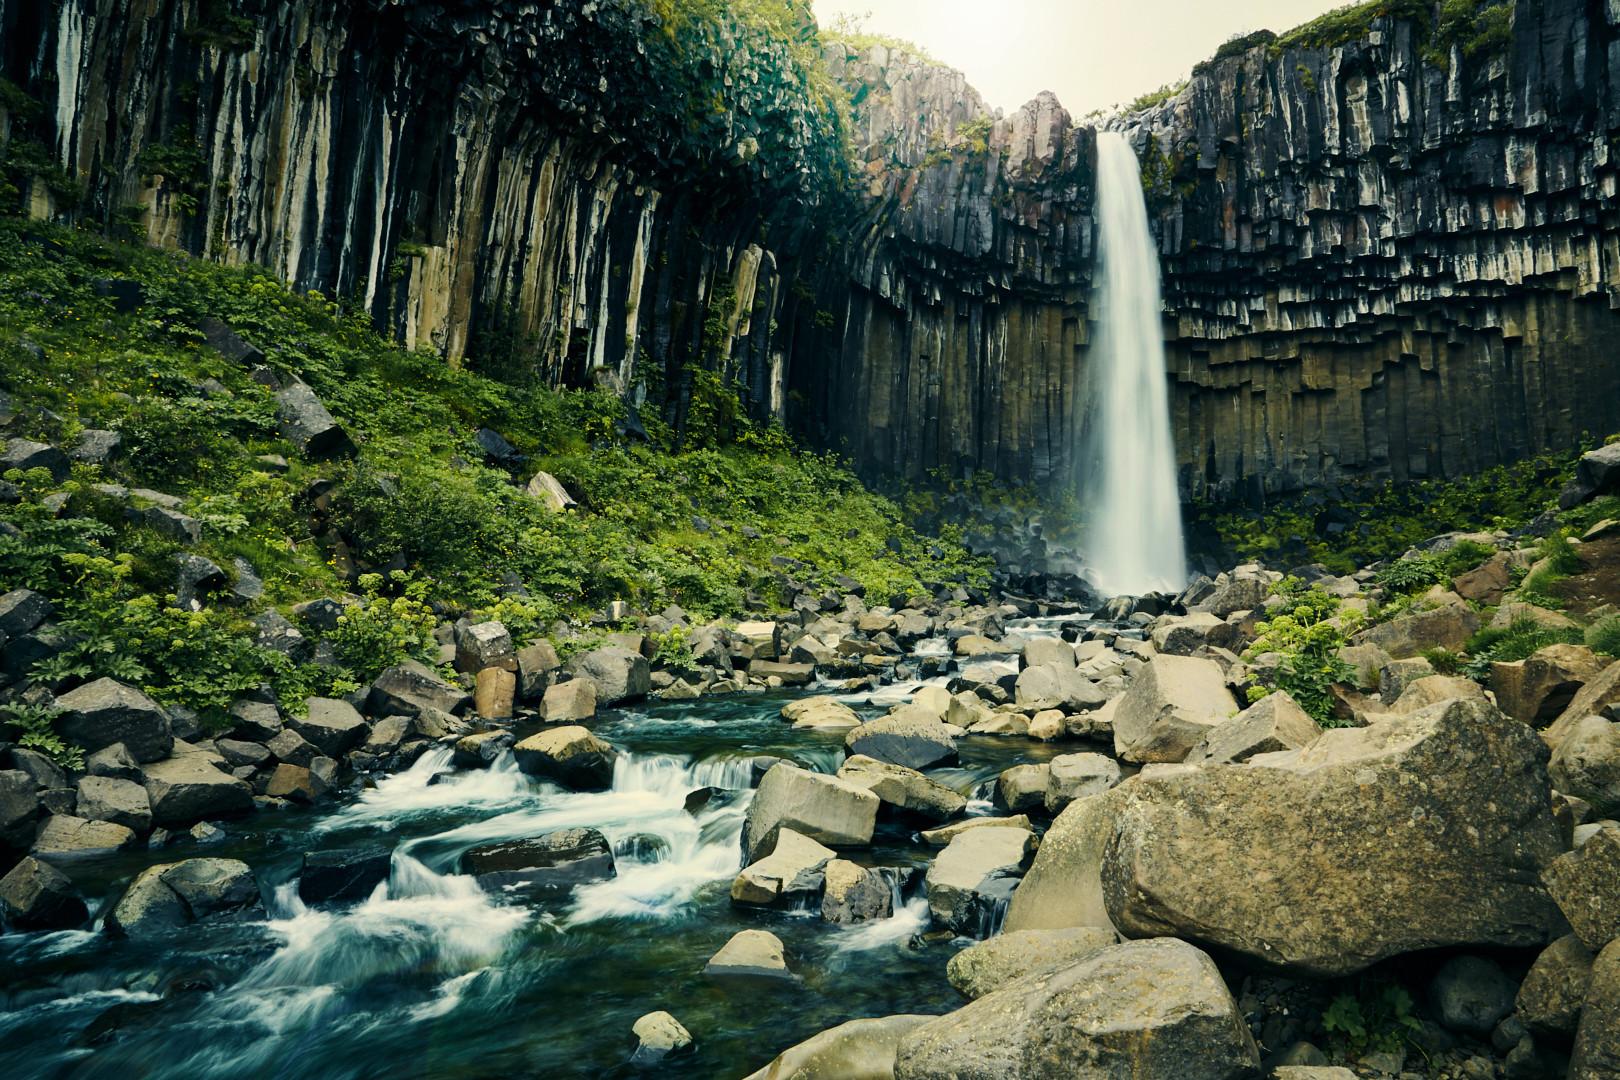 svartifoss, wasserfall, waterfall, iceland, island, roadtrip, rundreise, must see, bucketlist, miles and shores, reiseblog, reiseblogger